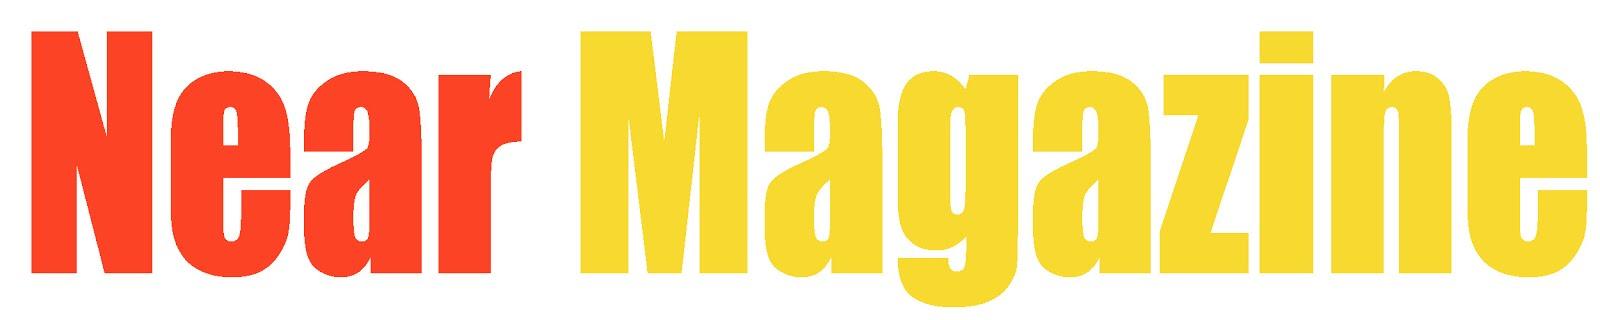 Near Magazine